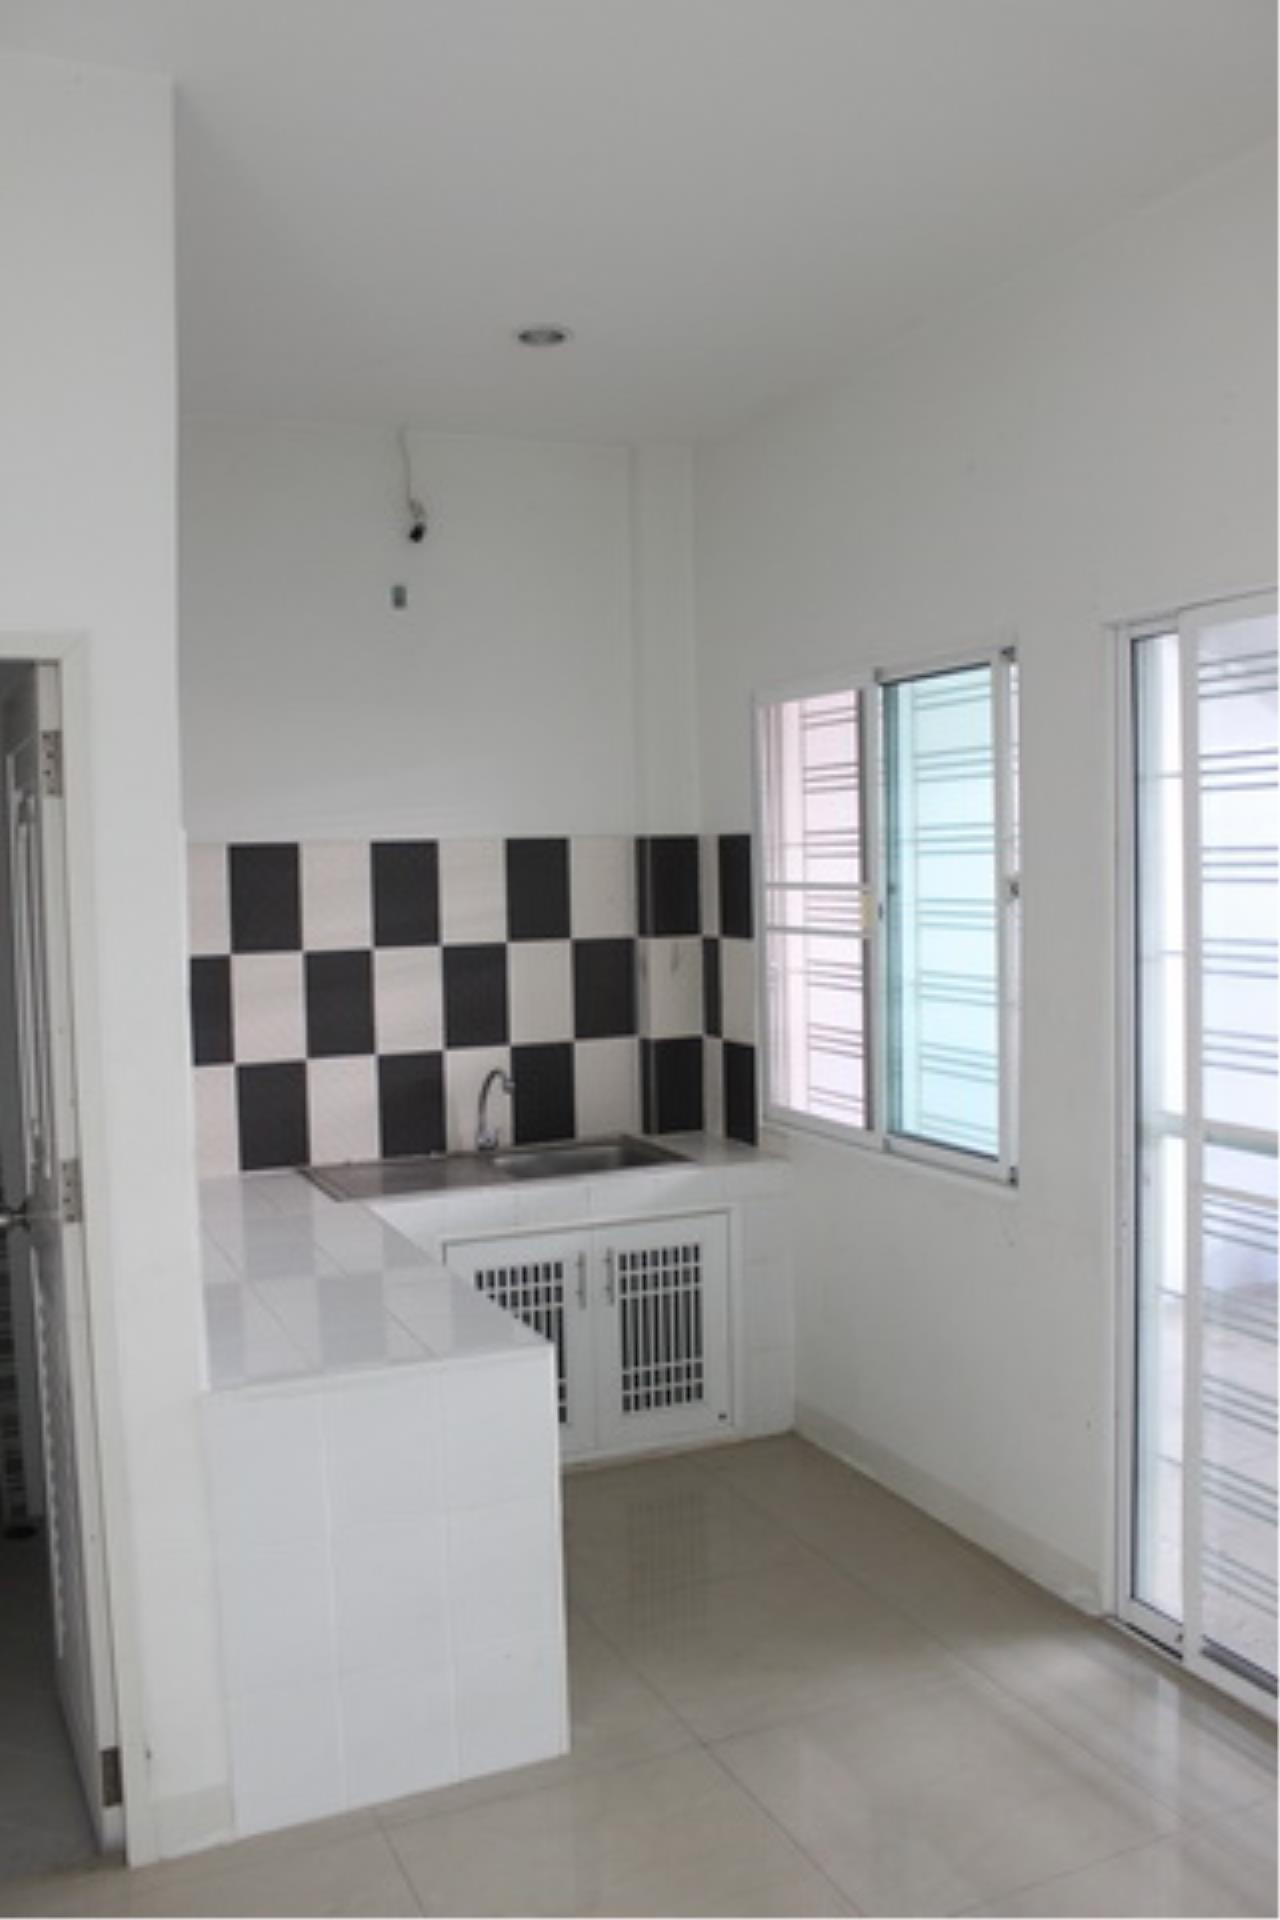 Forbest Properties Agency's 38974 - Townhome RK Park 3 stories Ramintra-Ramkhamhaeng Road, 22 sq.w 7